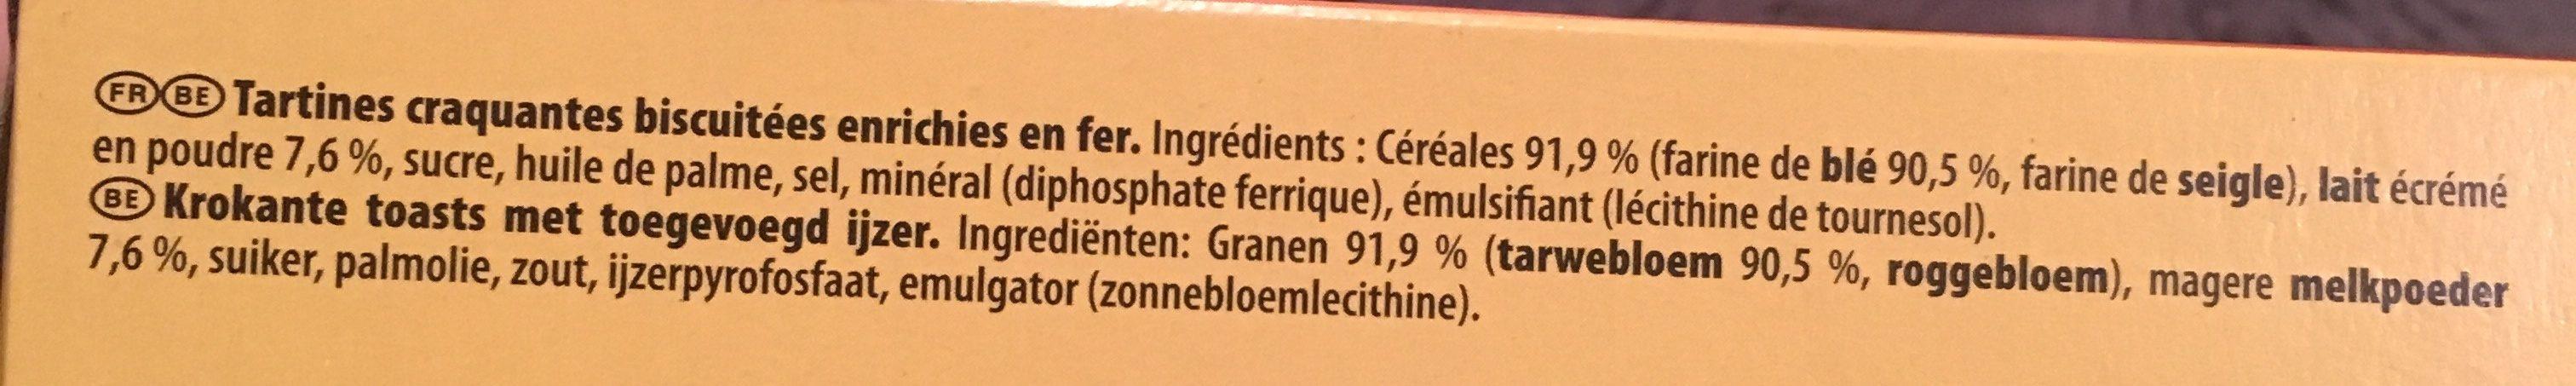 Cracotte gourmande 2 sachets fraicheur - Ingredients